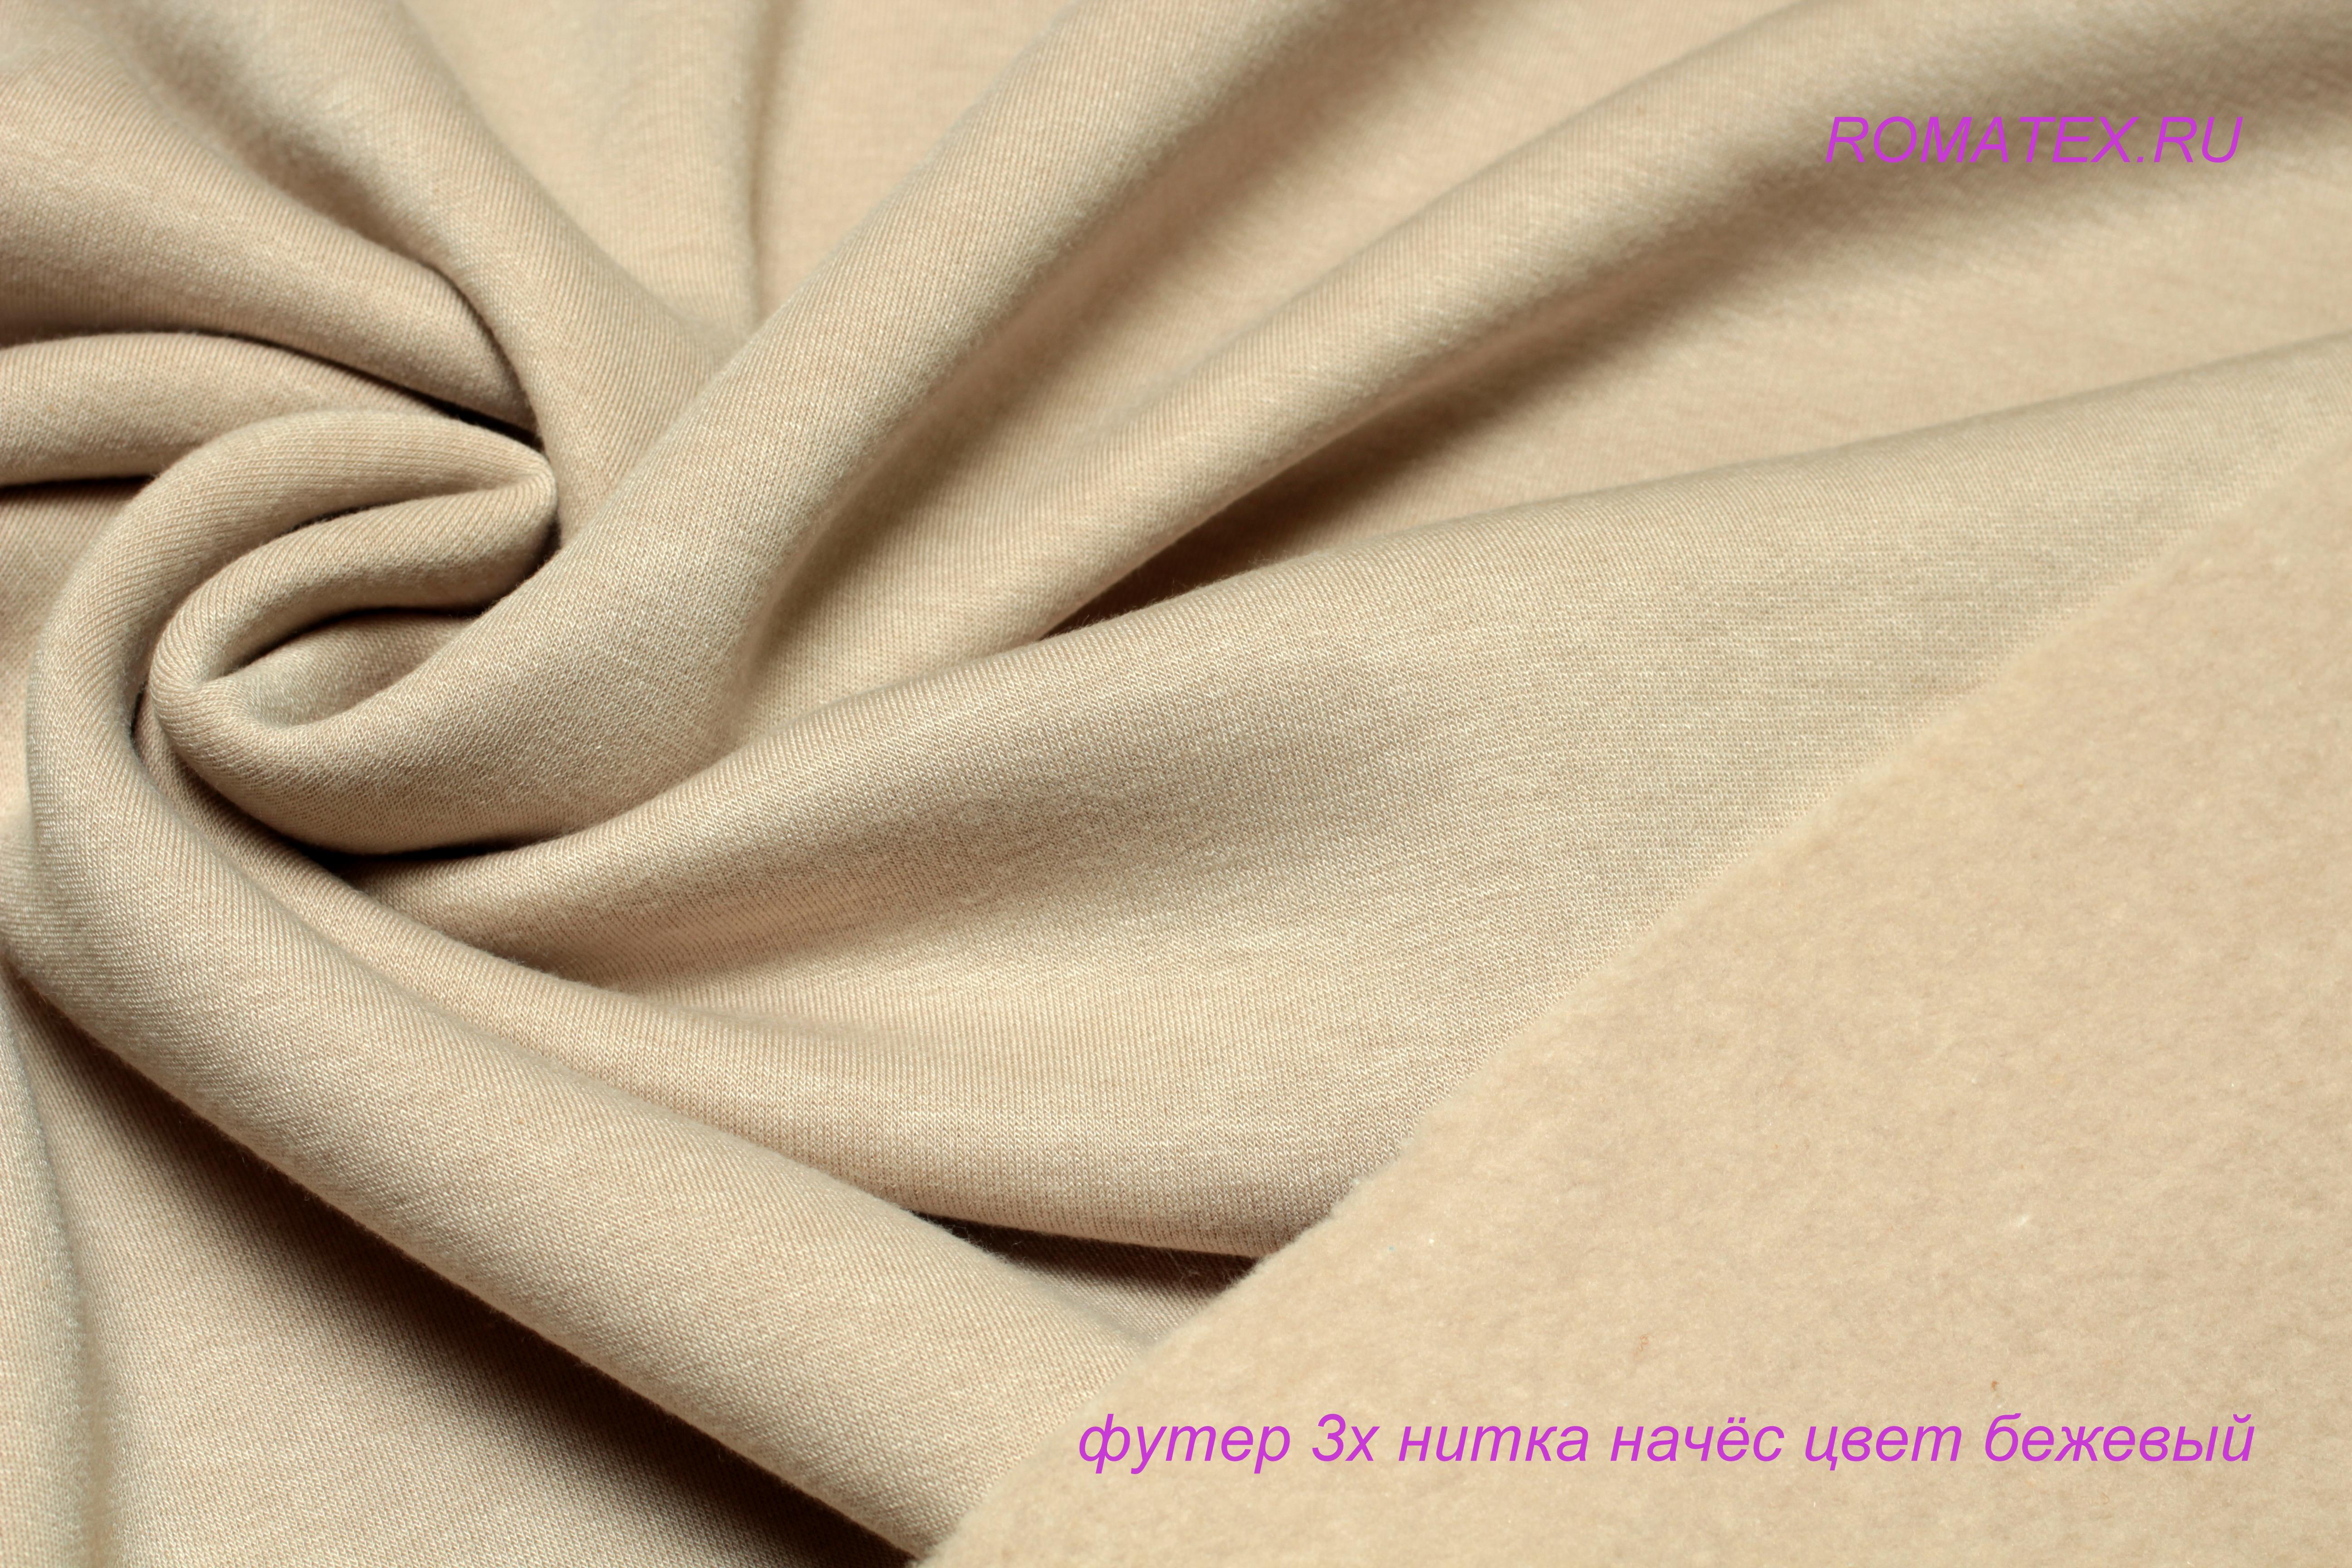 Футер 3-х нитка начес качество Пенье цвет бежевый